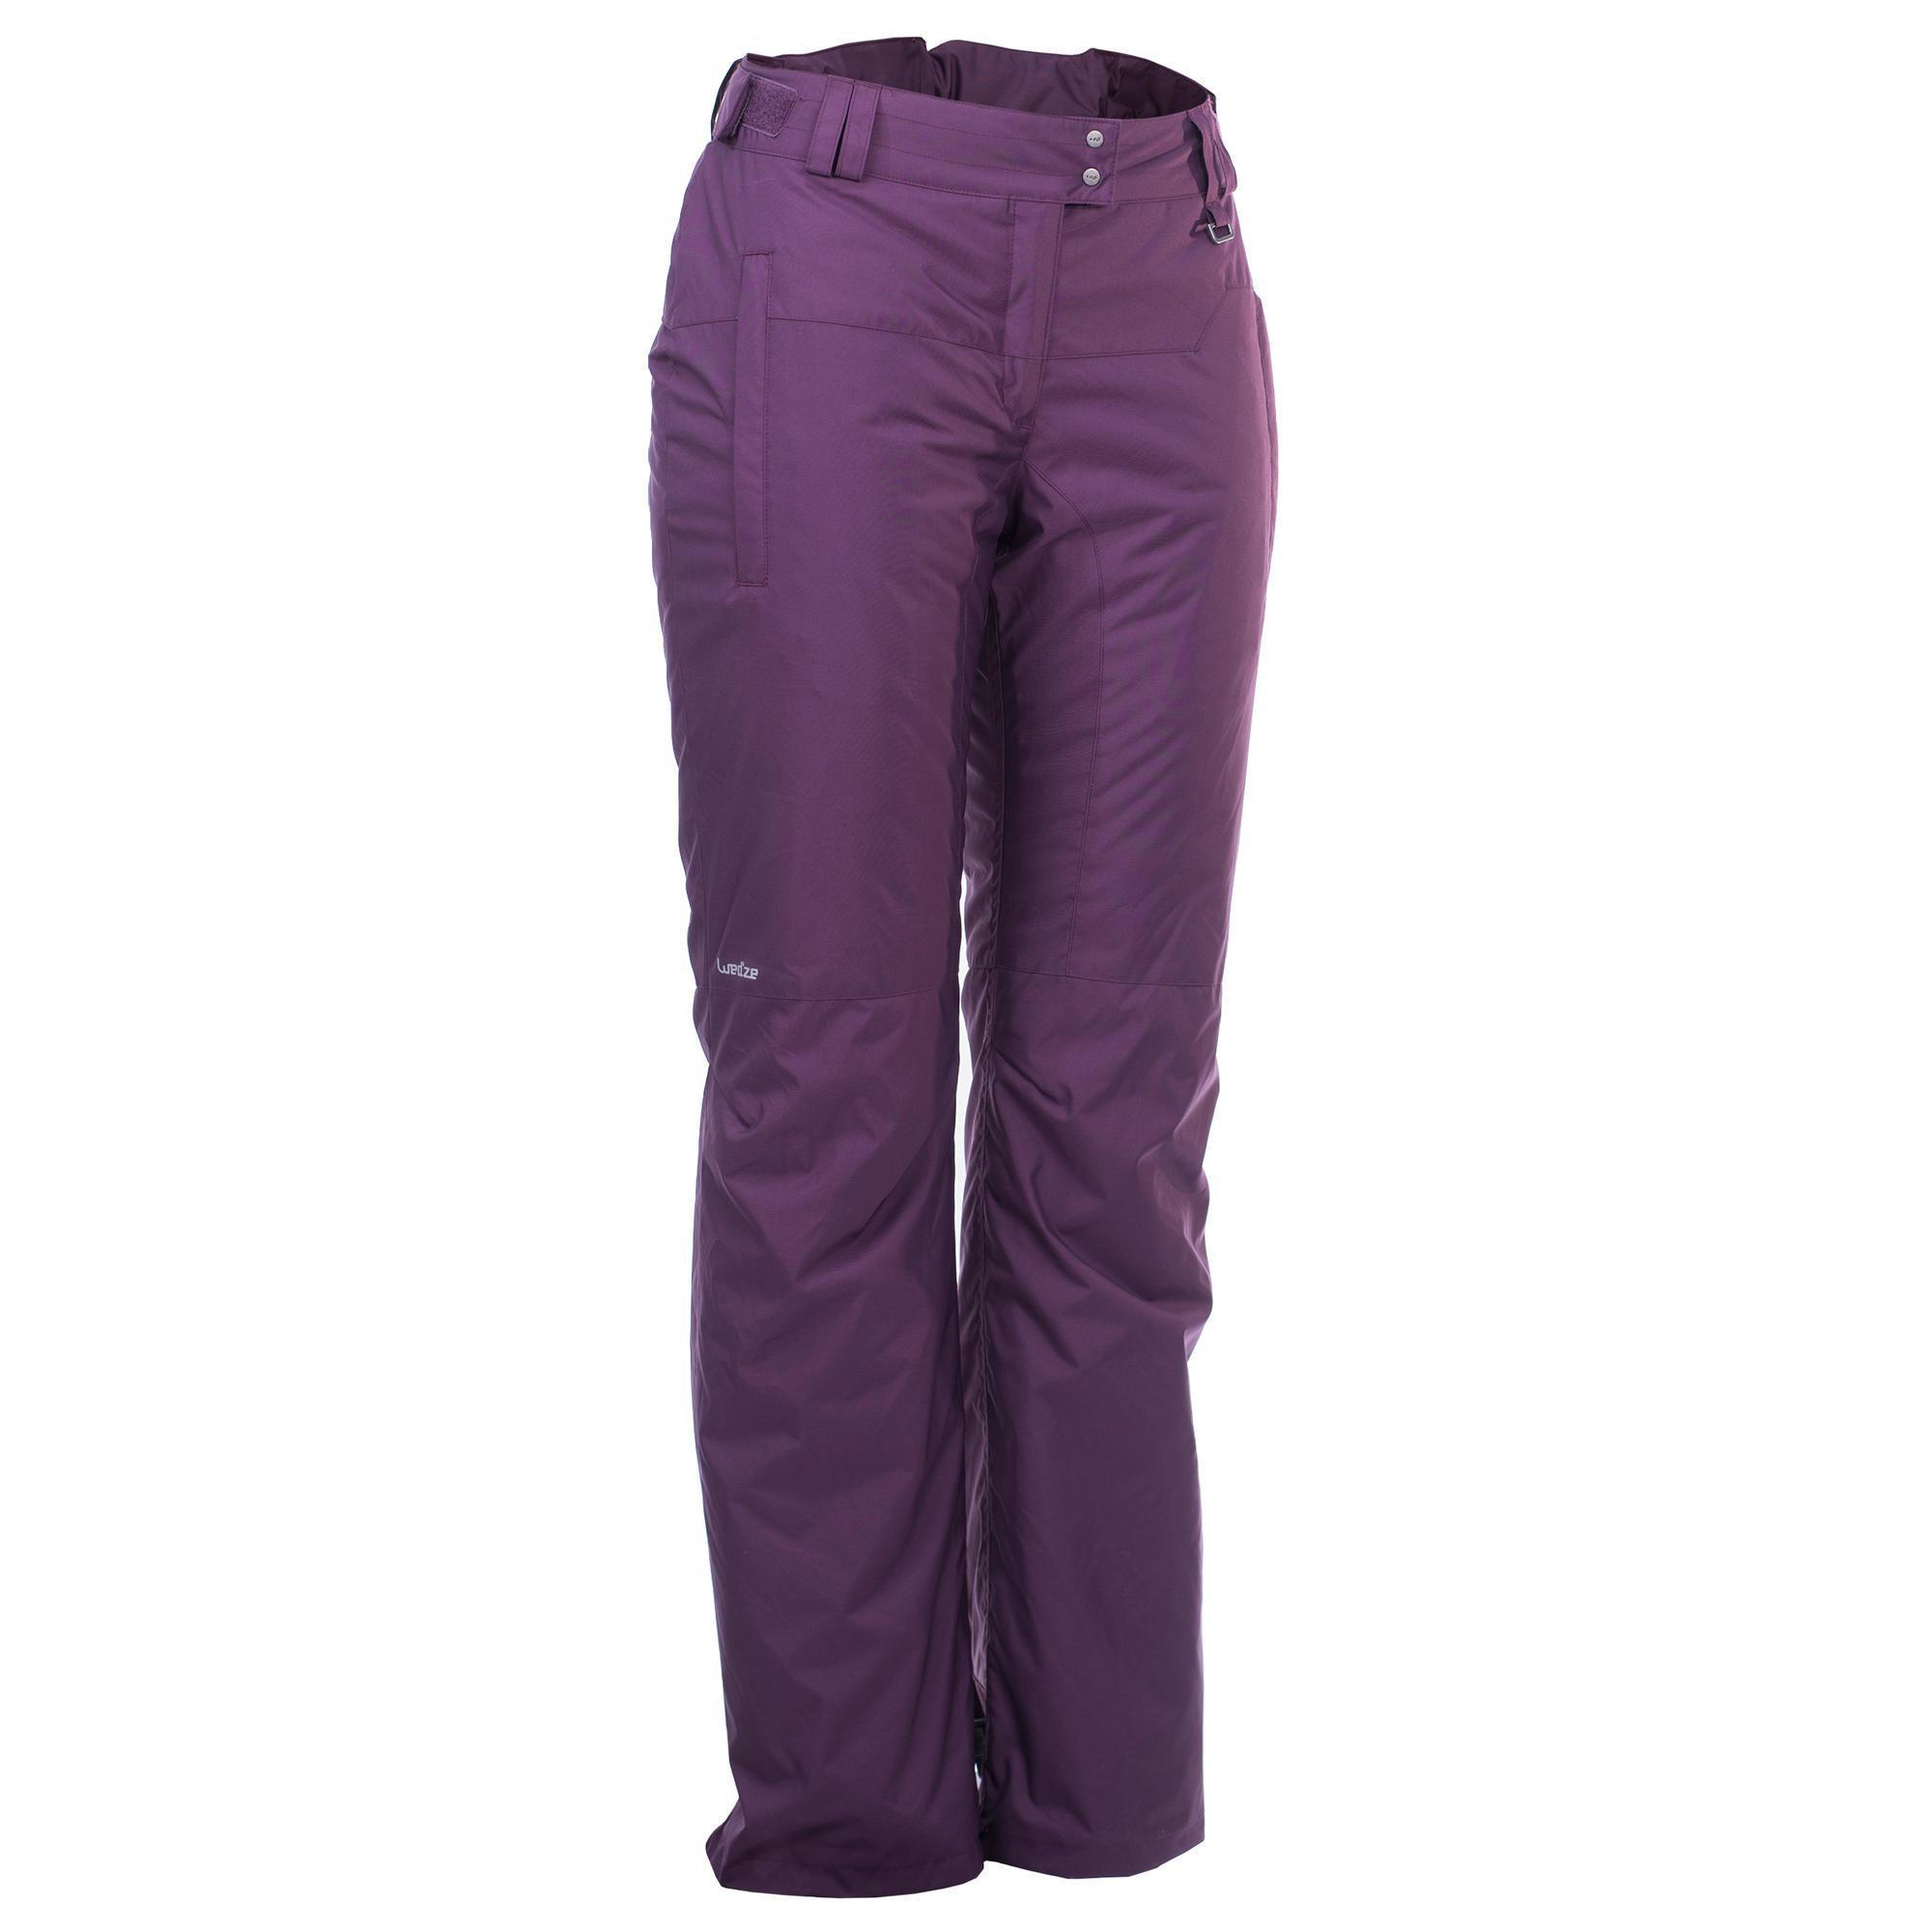 Damen Snowboardhose SNB PA 100 Damen violett | 03608449875332